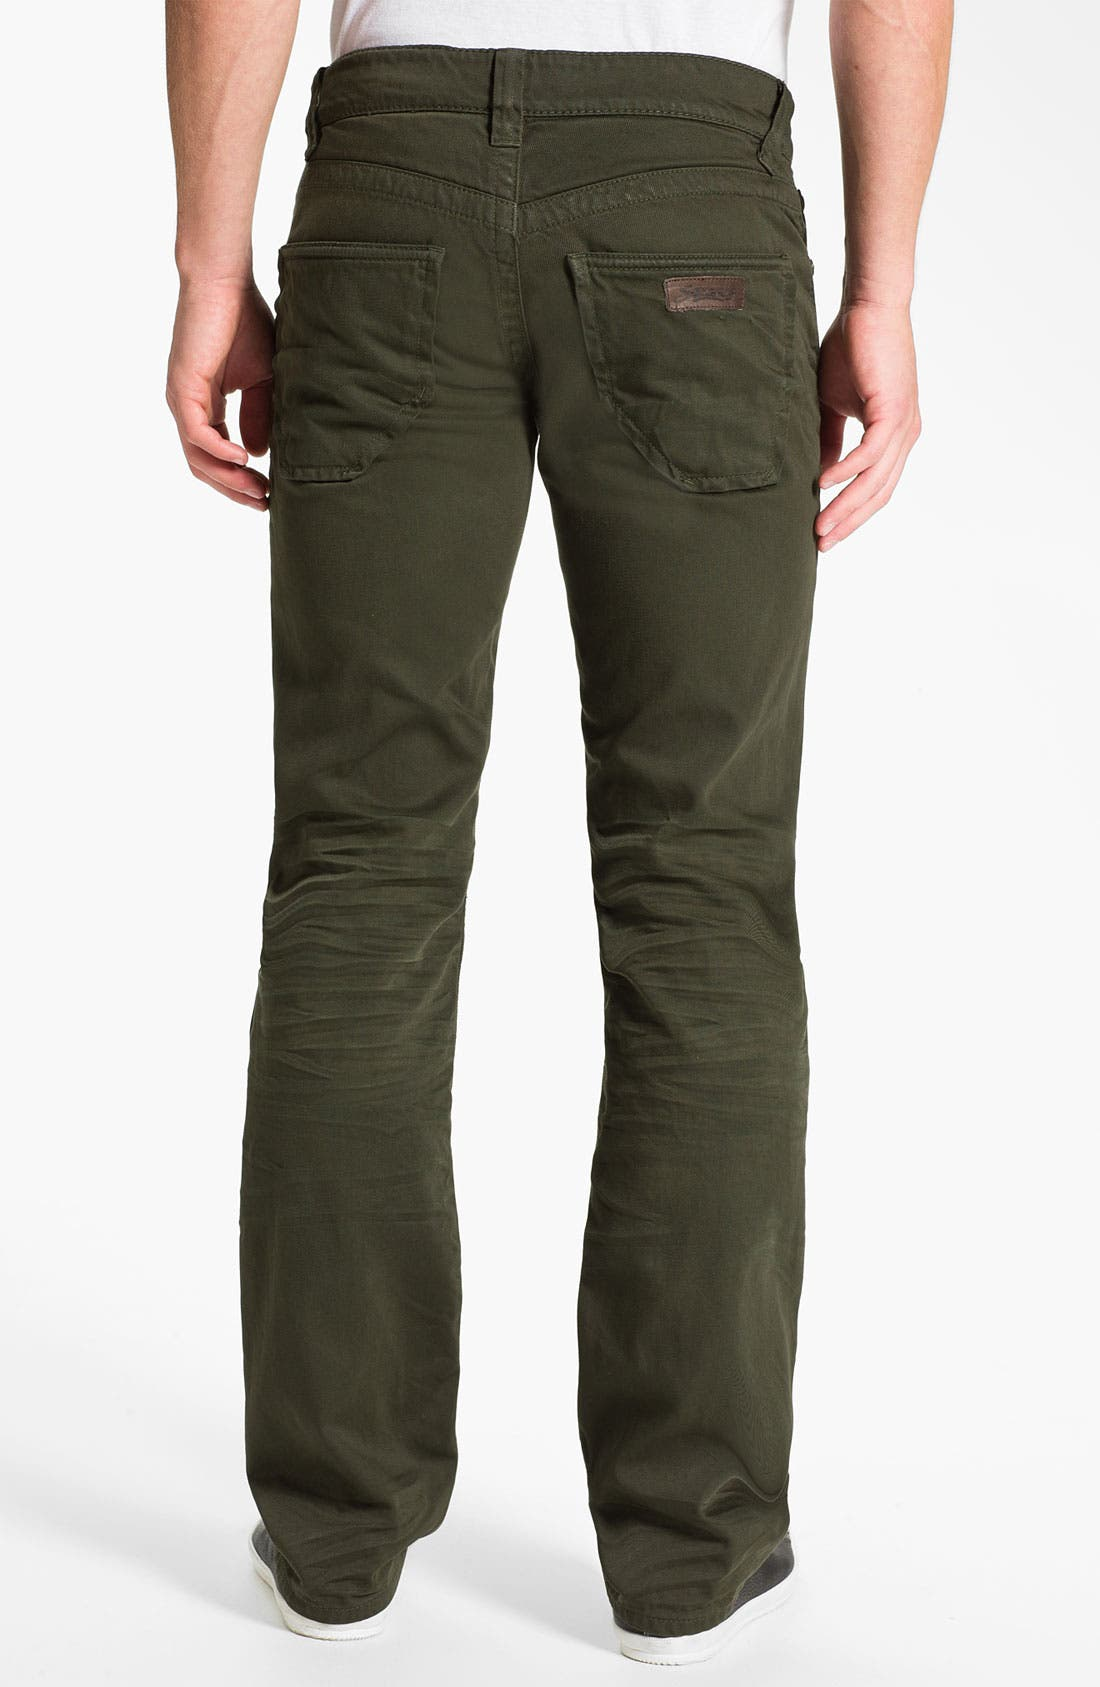 Main Image - Stitch's Jeans Twill Straight Leg Pants